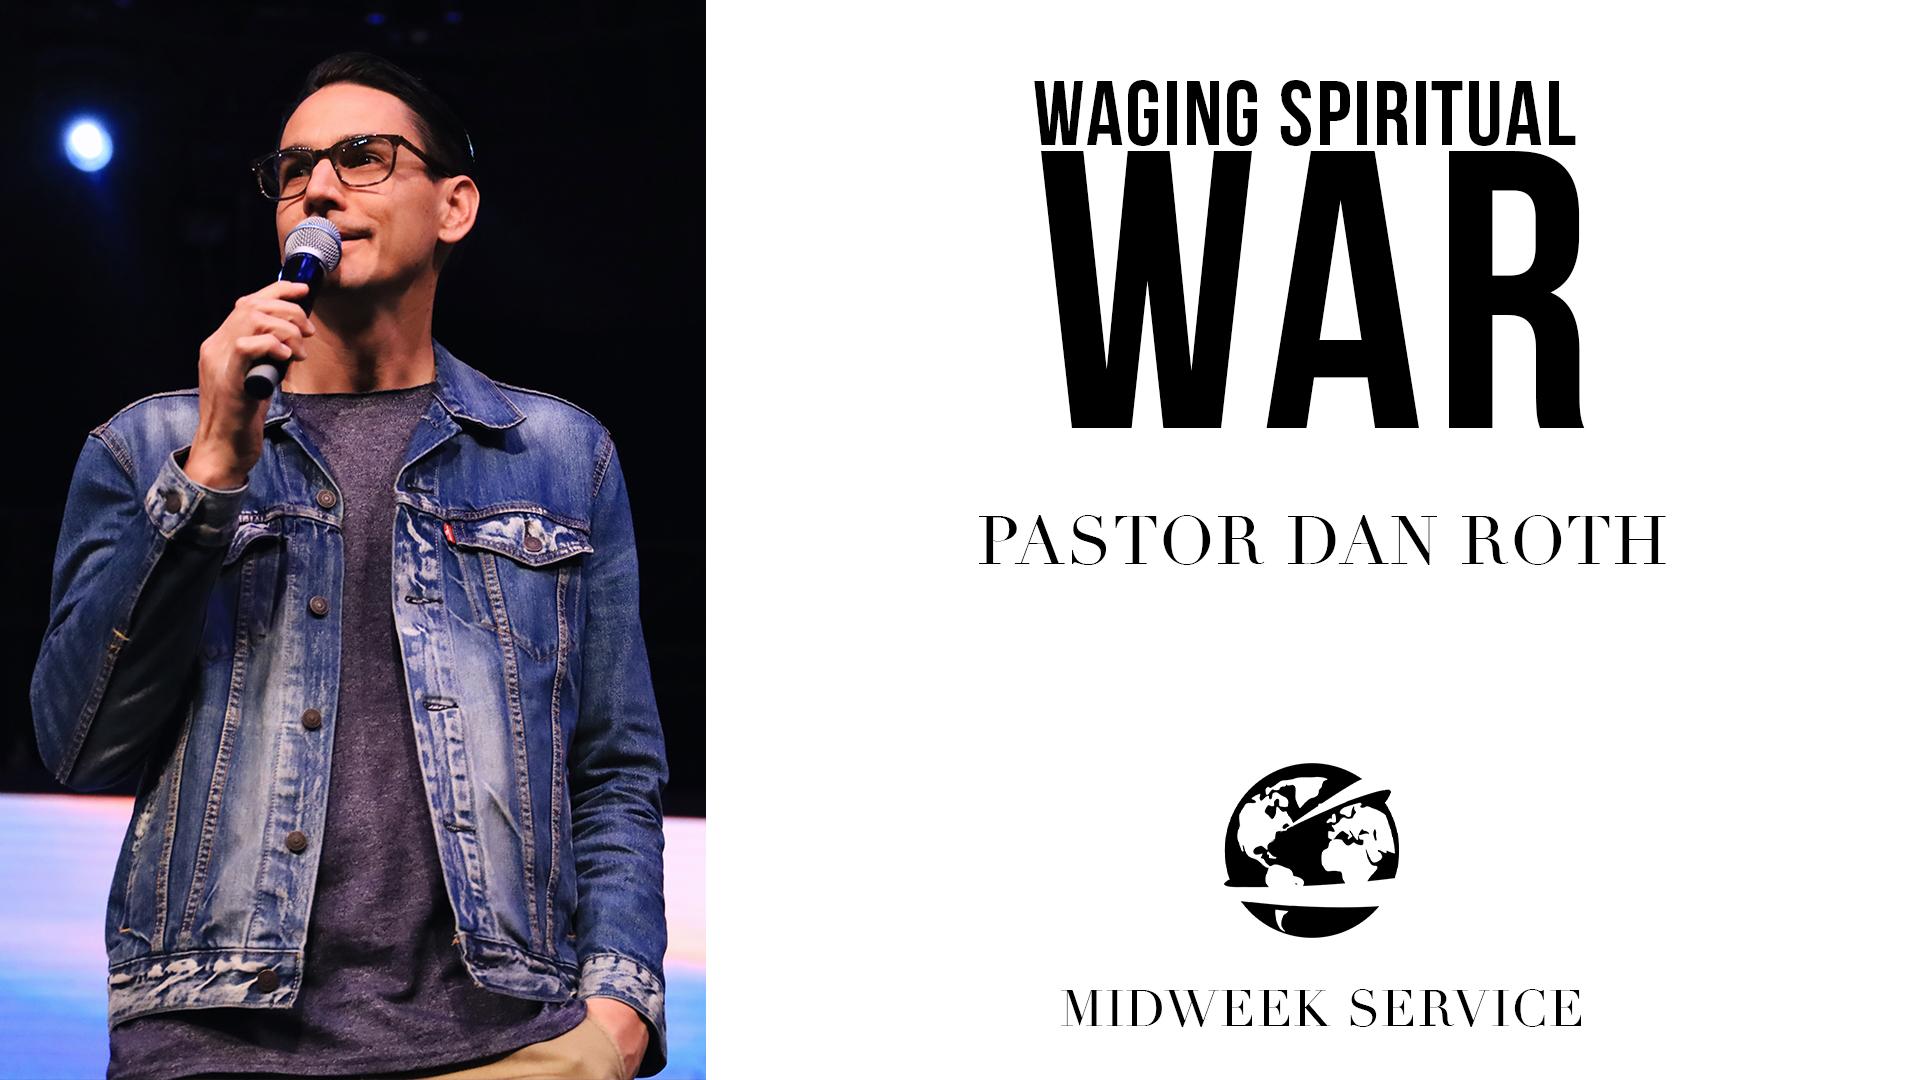 Watch Waging Spiritual War Part 2